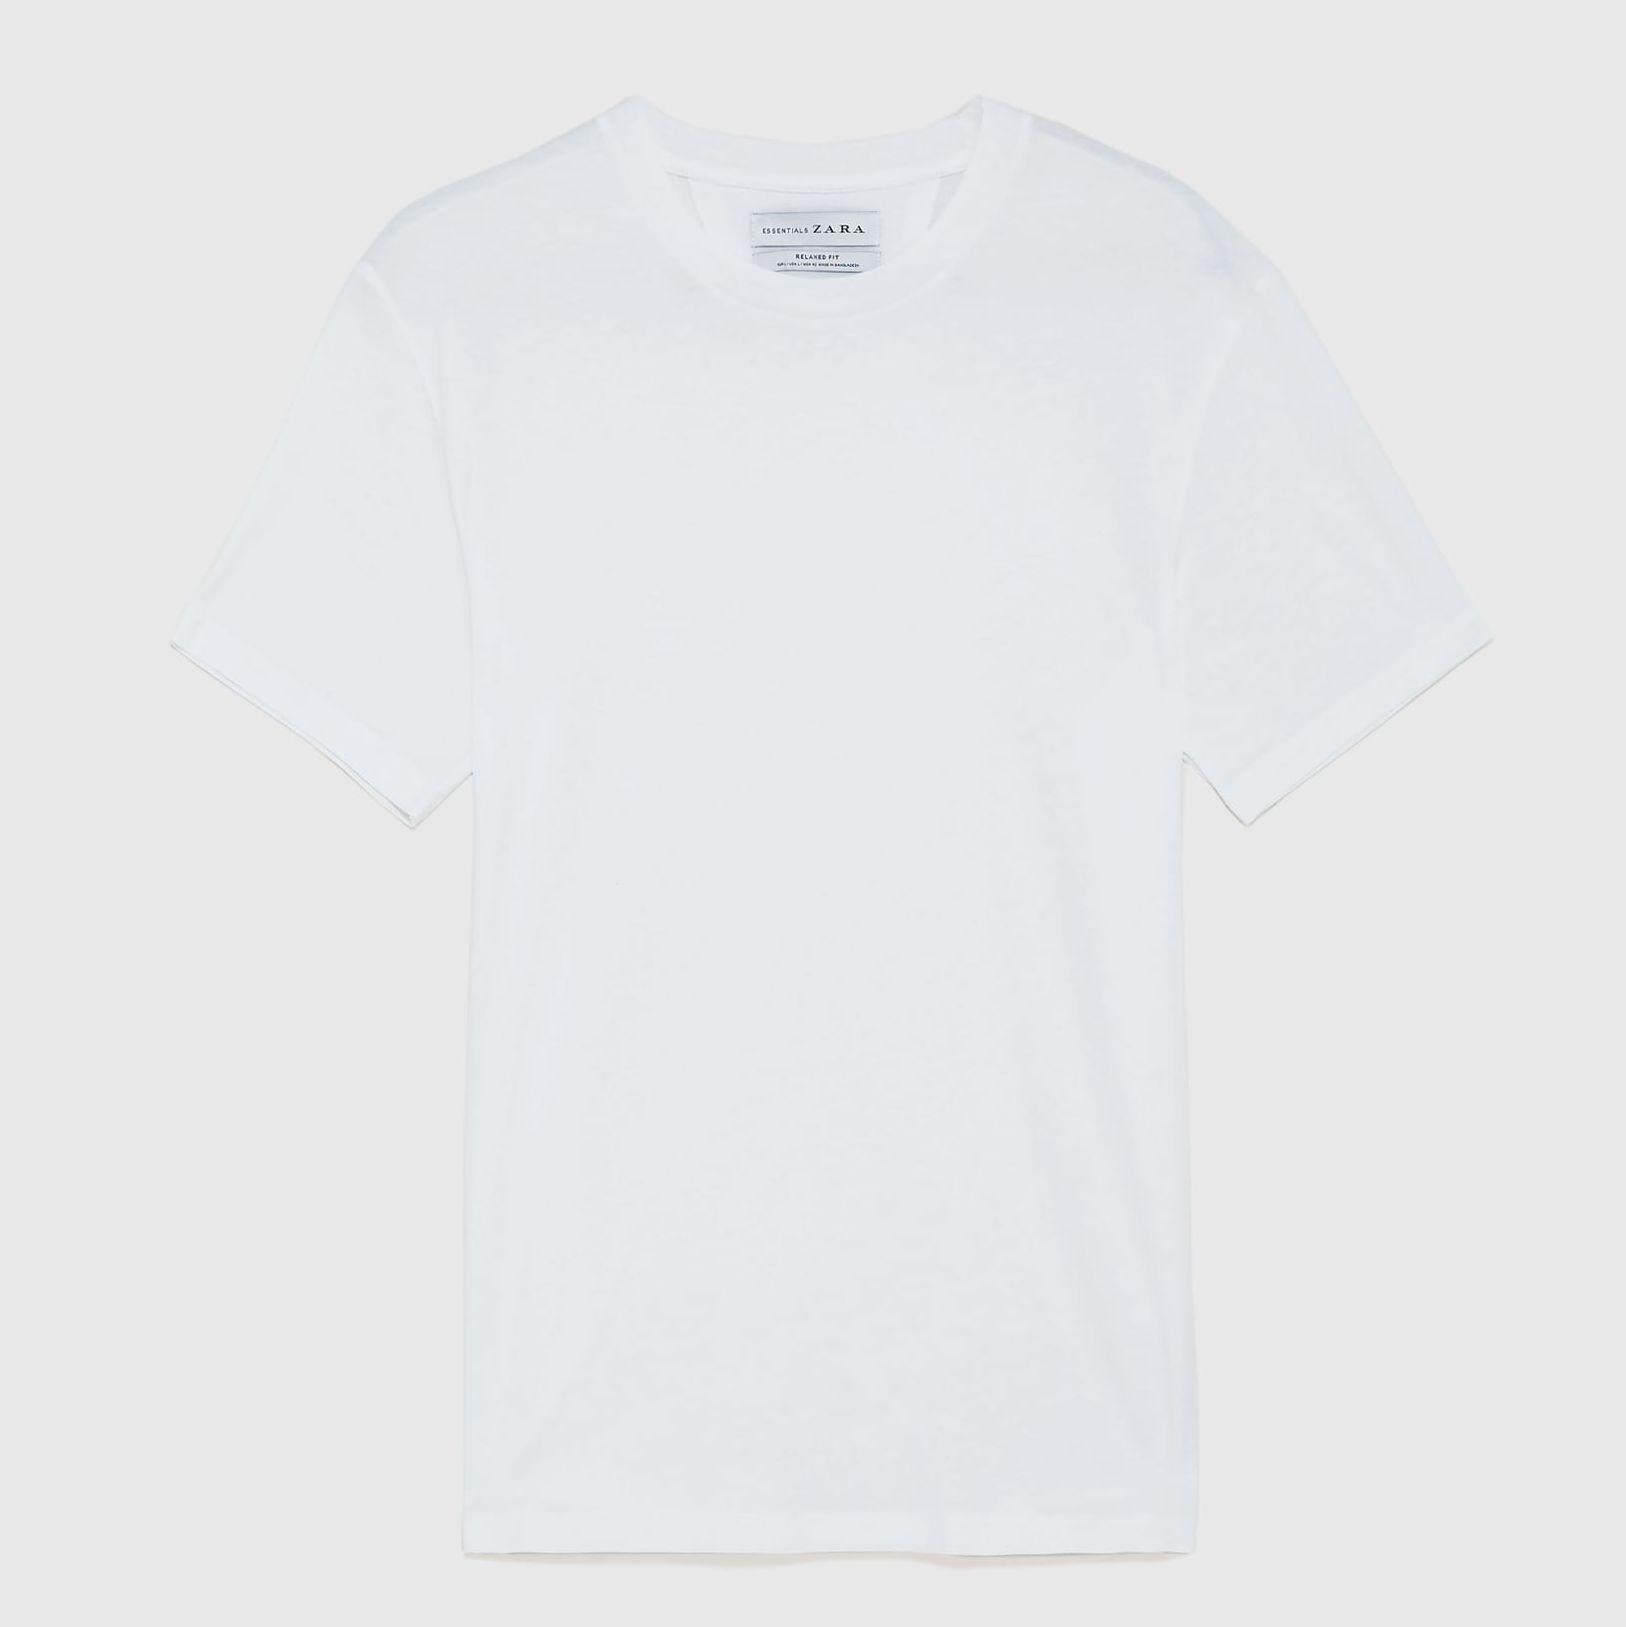 Camiseta blanca Zara, camiseta hombre